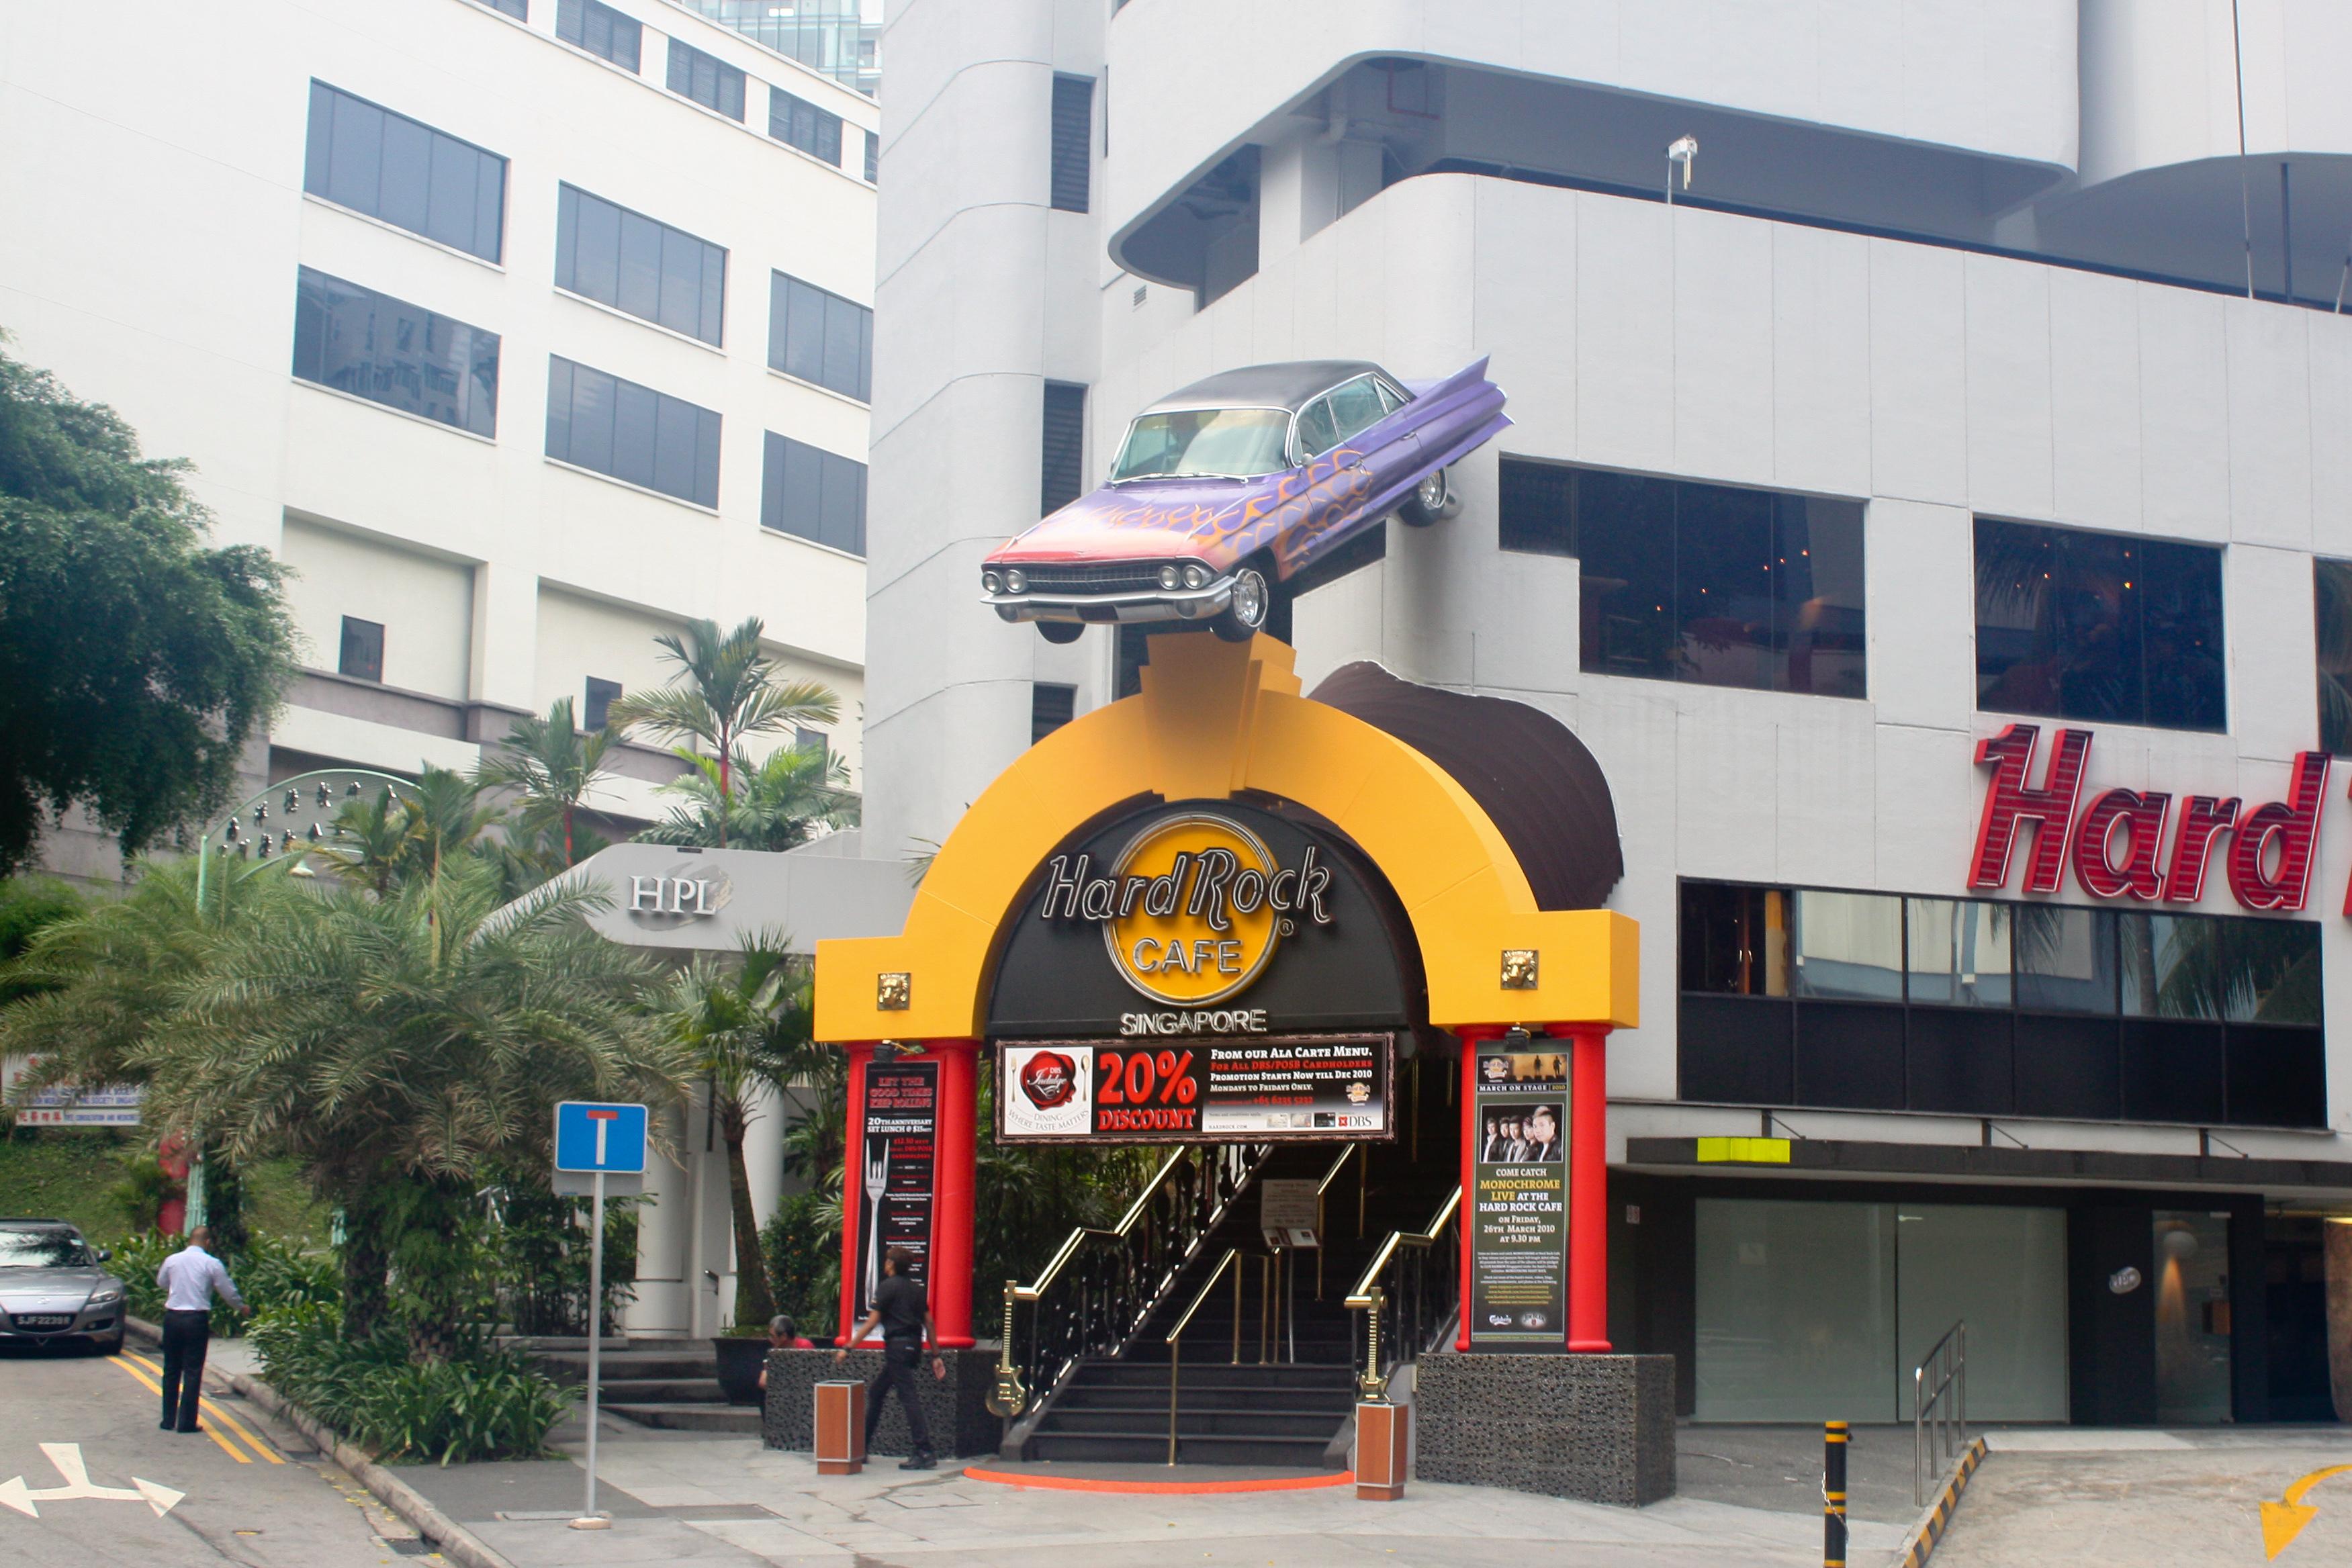 Hard Rock Cafe Singapore Location